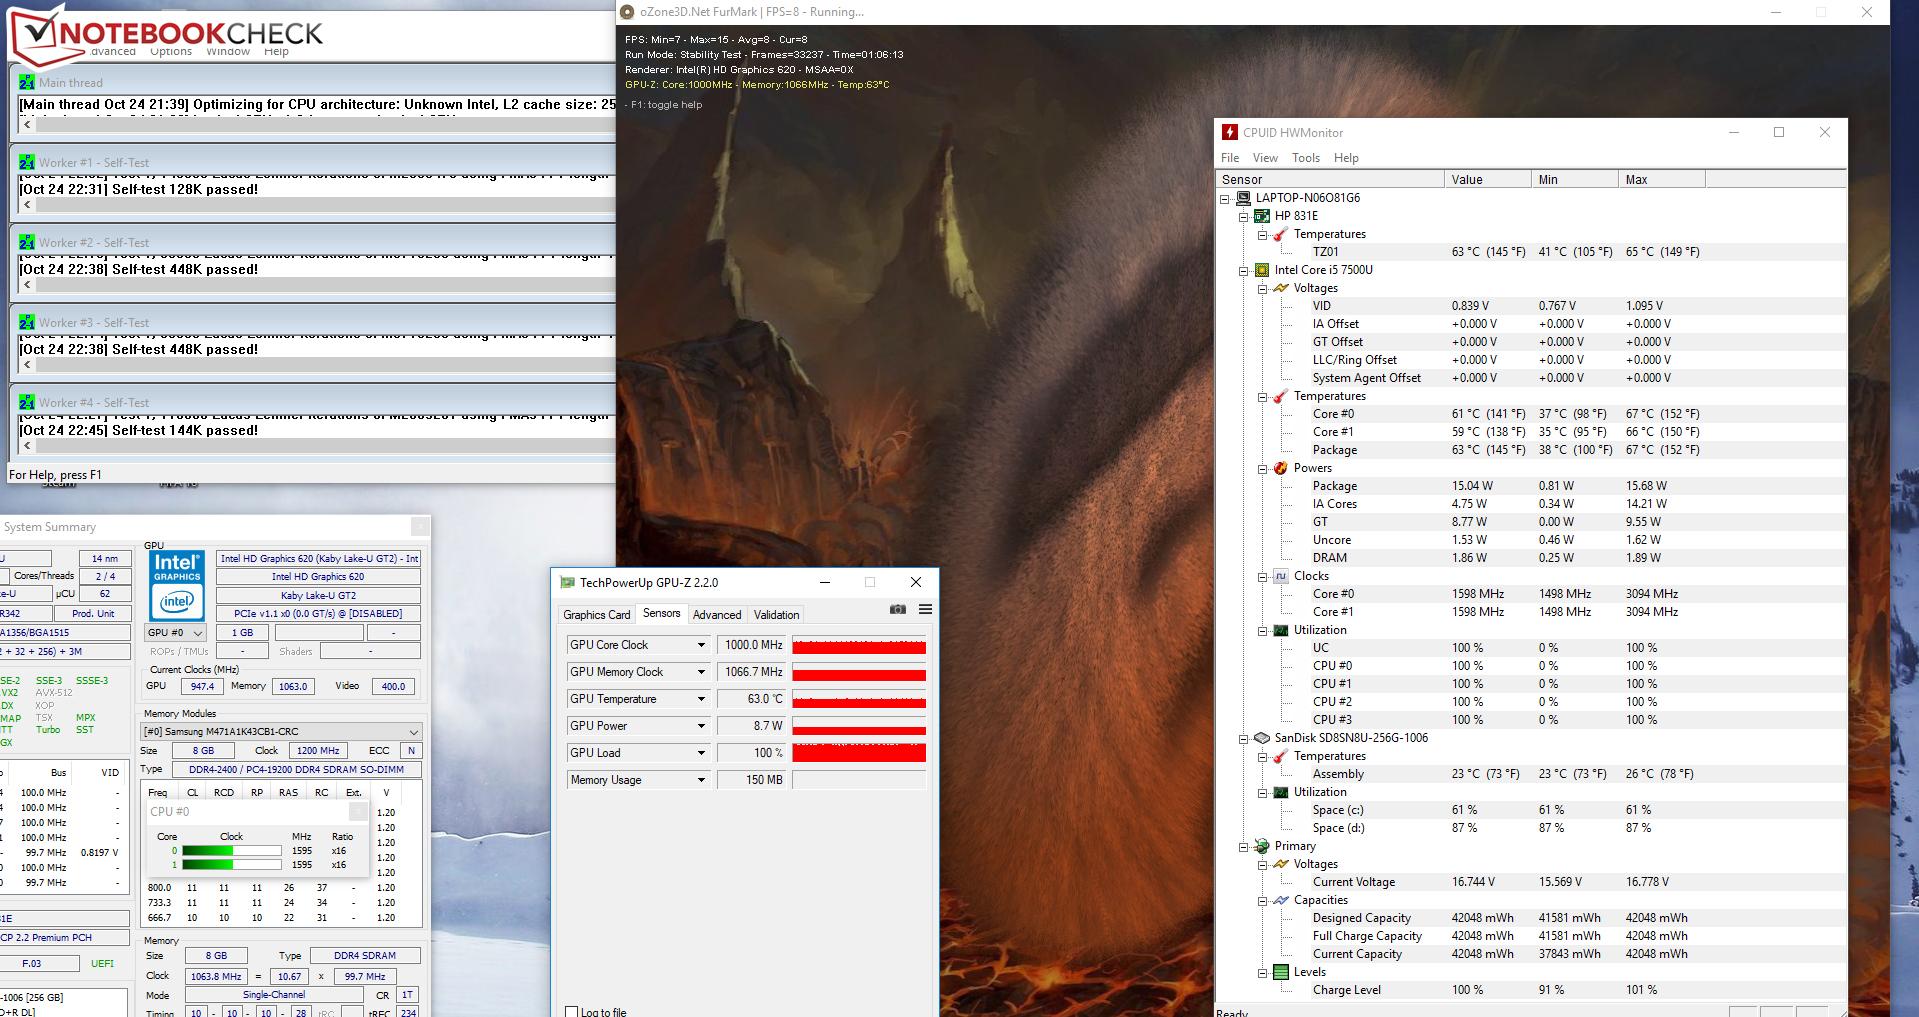 HP 14-bs007ng (i5-7200U, FHD) Laptop Review - NotebookCheck